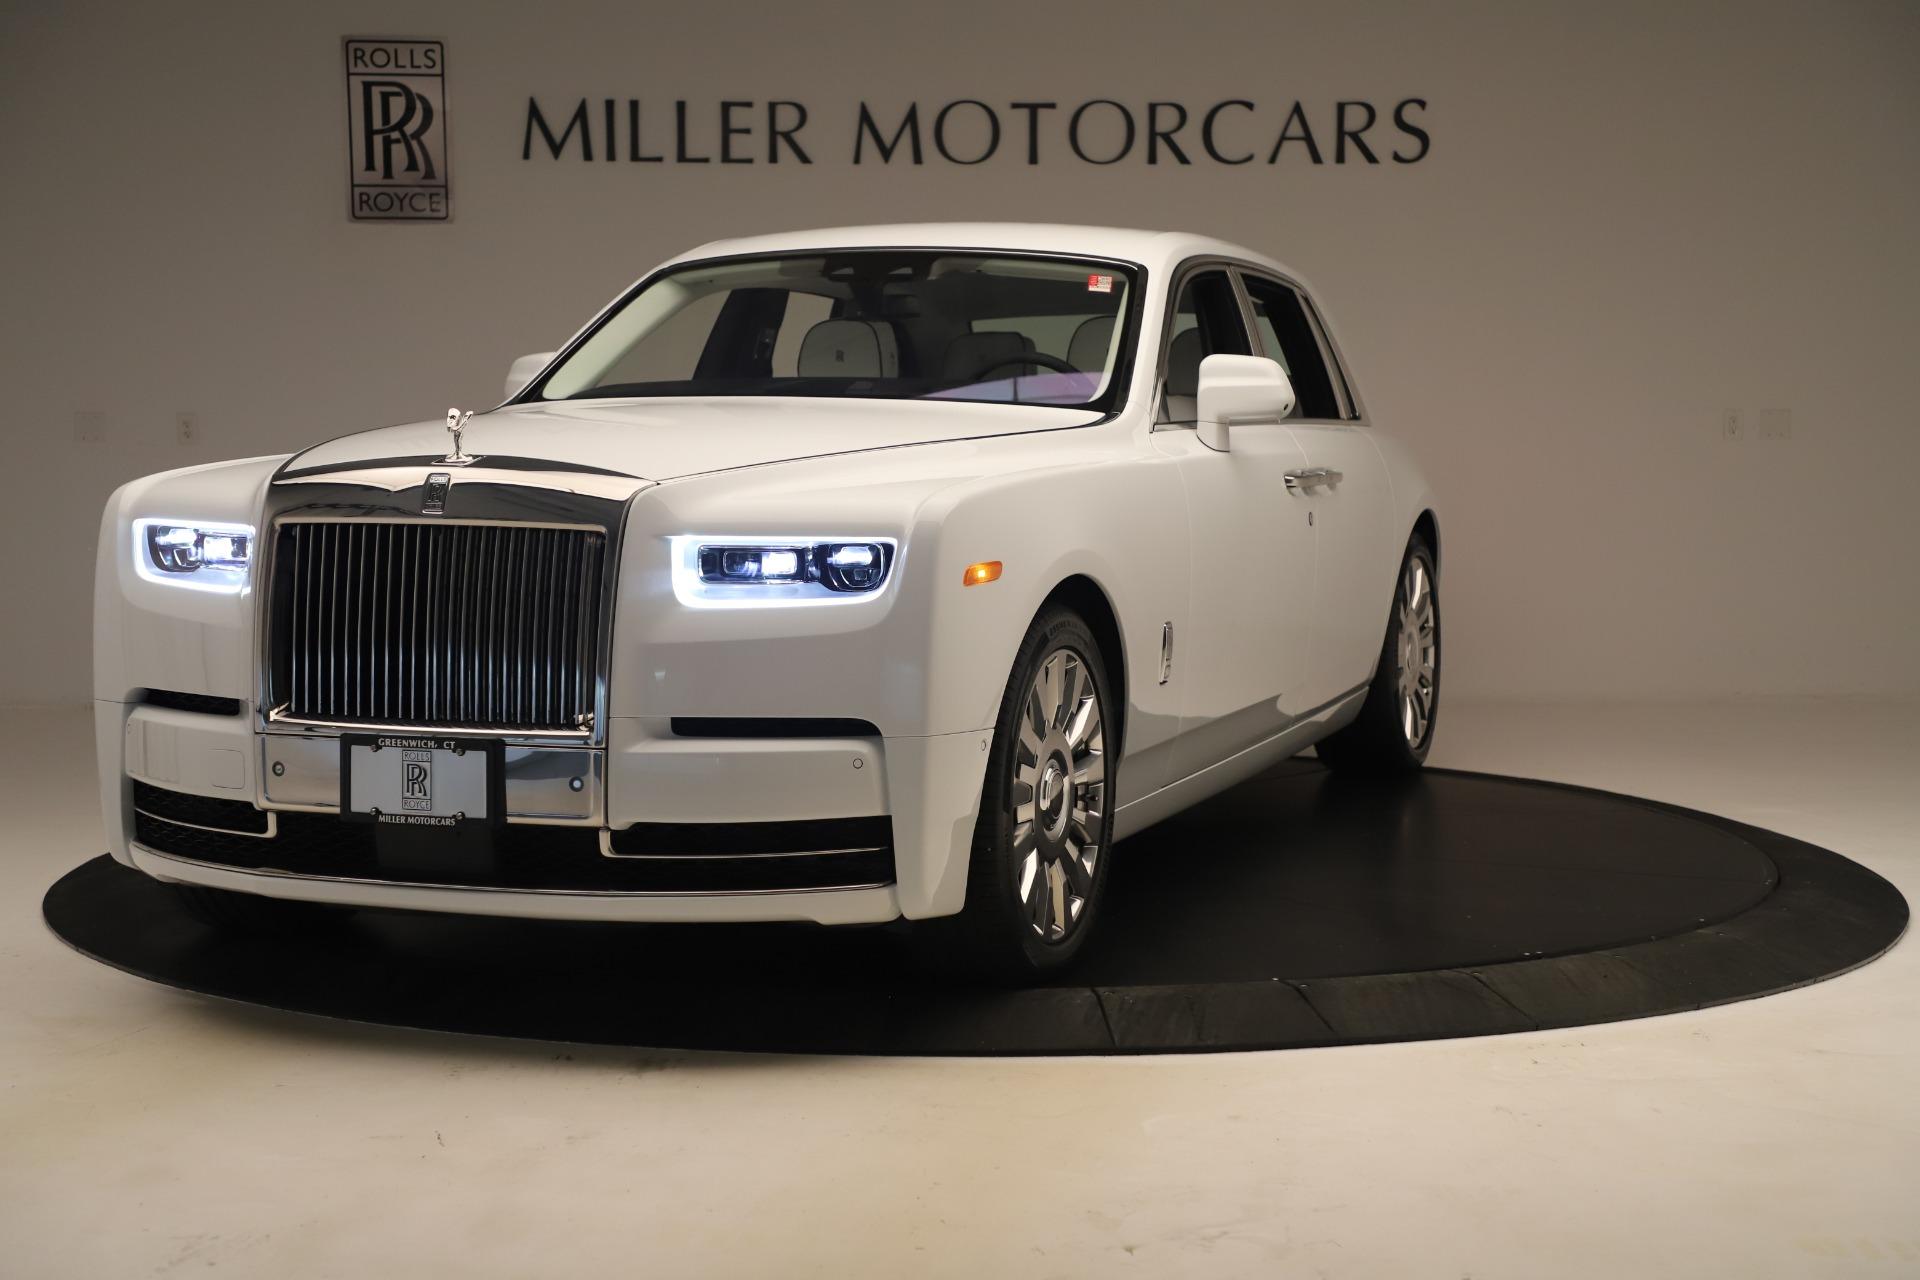 For Sale 2020 Rolls Royce Phantom Miller Motorcars United States For Sale On Luxurypulse